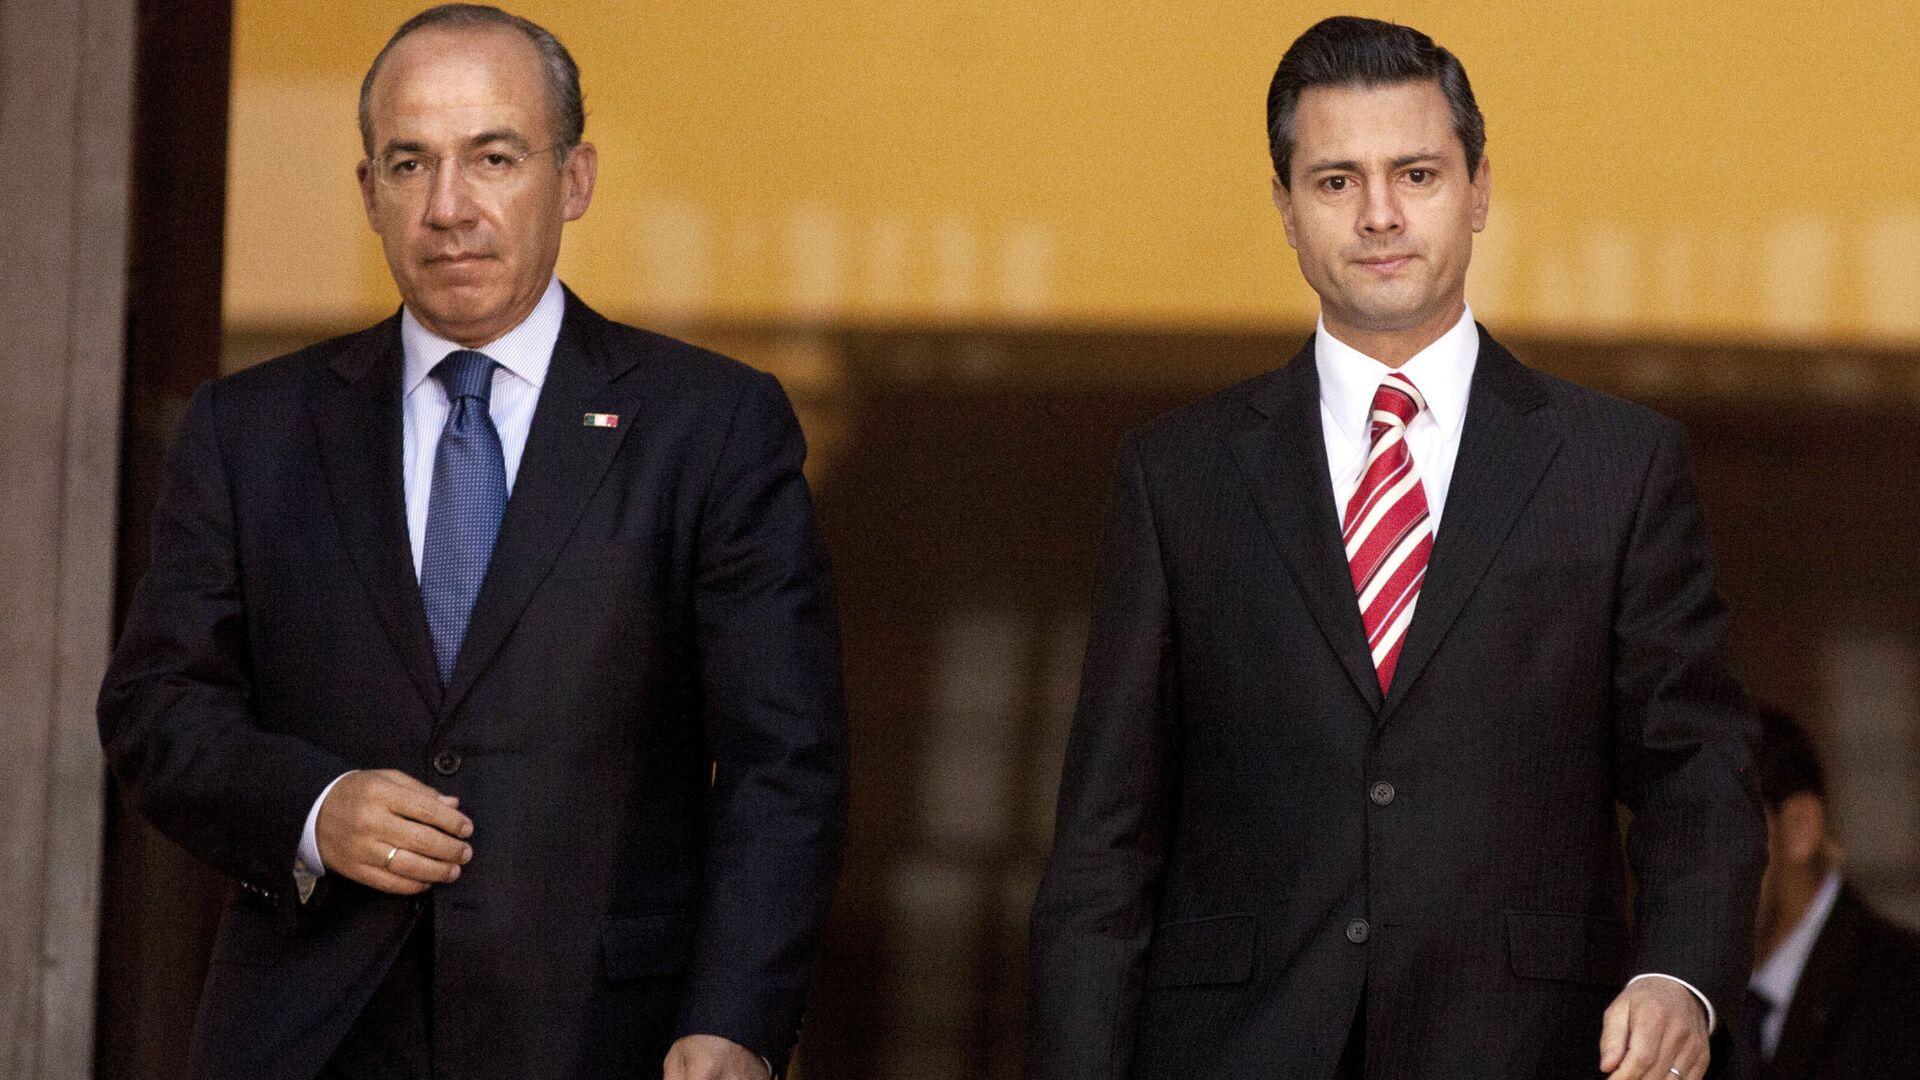 Felipe Calderón Hinojosa y Enrique Peña Nieto, expresidentes de México - Sputnik Mundo, 1920, 27.08.2021